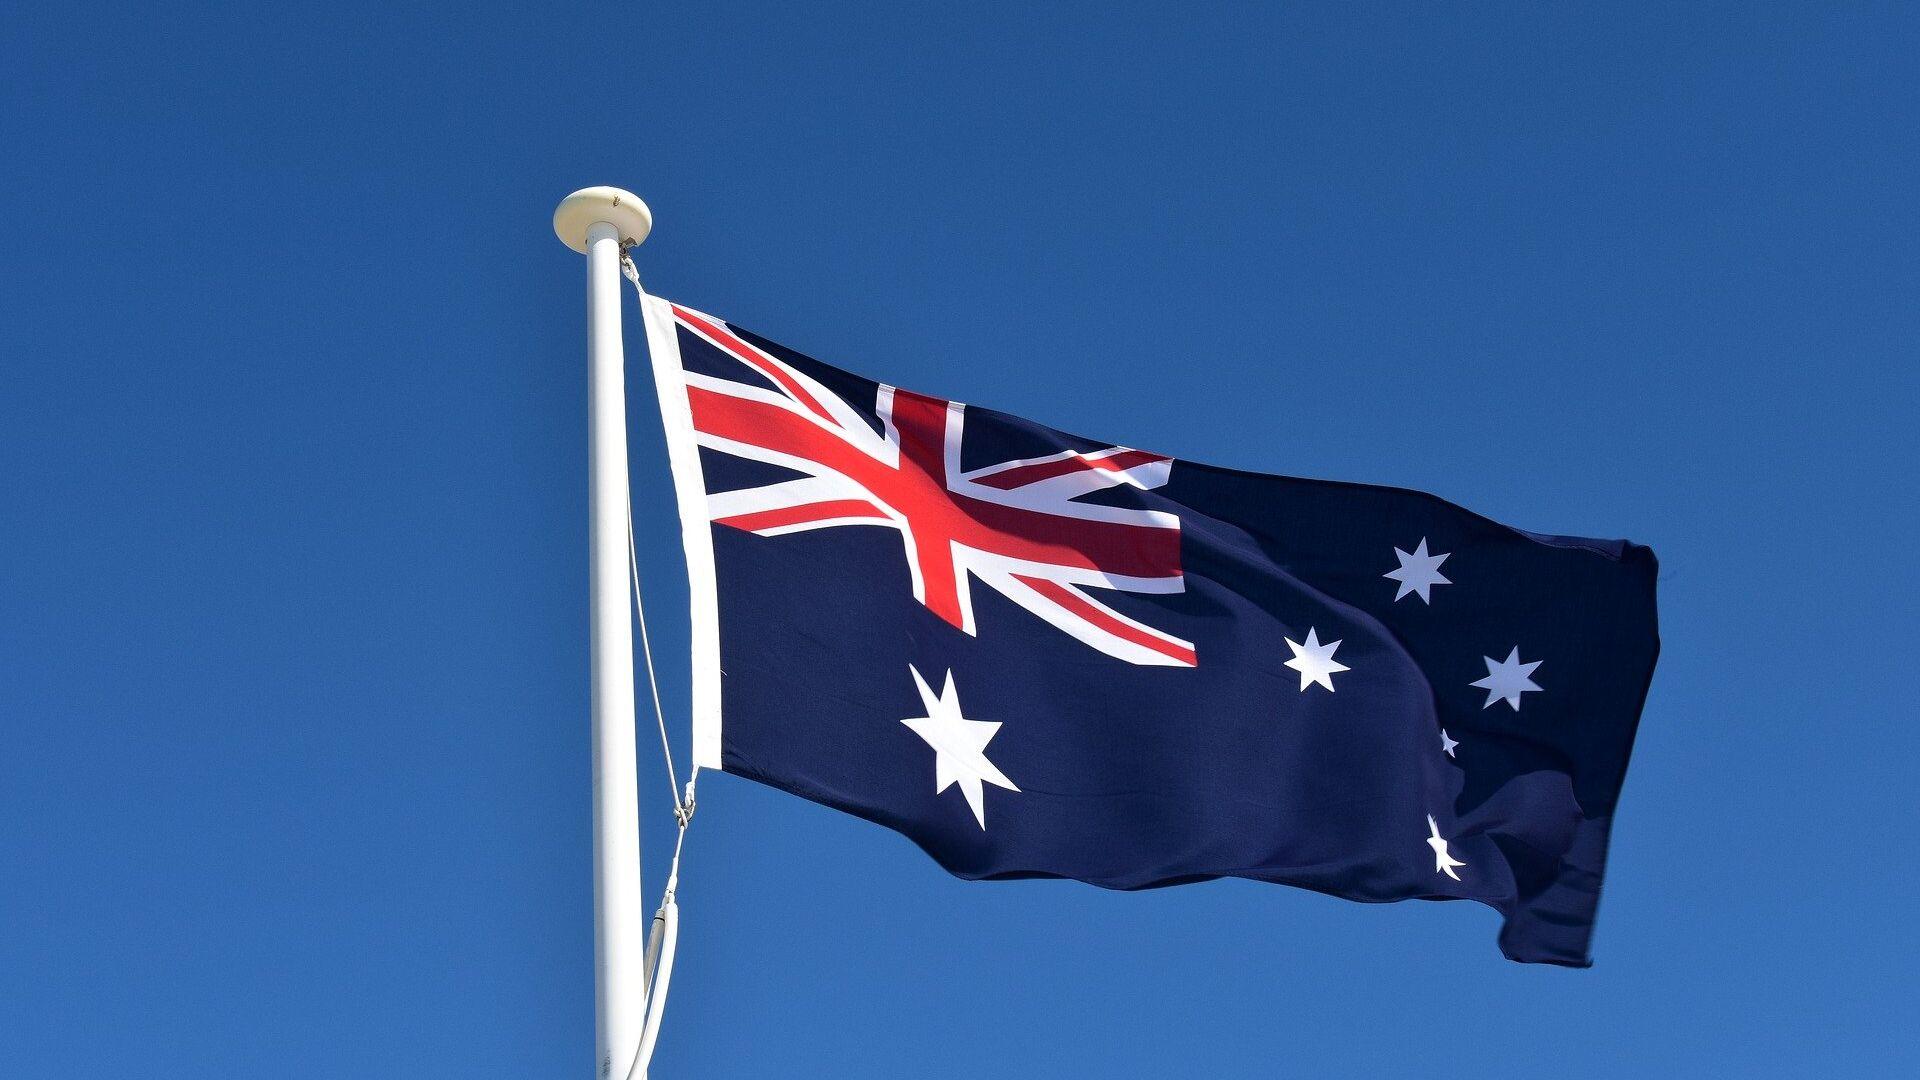 Bandiera dell'Australia - Sputnik Italia, 1920, 29.03.2021